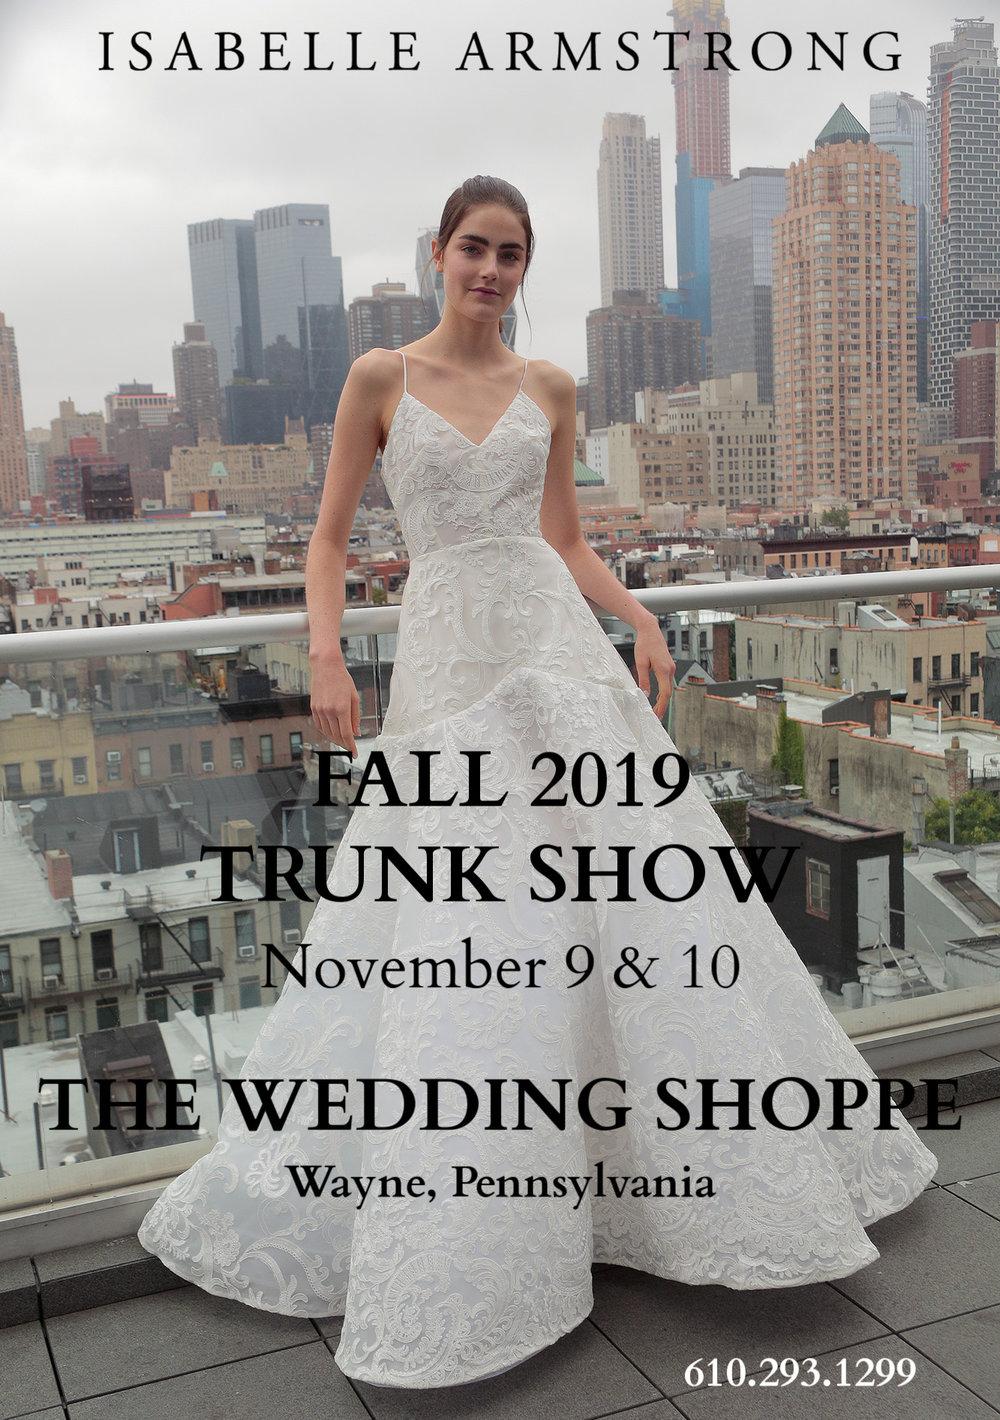 IA TRUNK SHOW - WEDDING SHOPPE 11_9_18.jpg